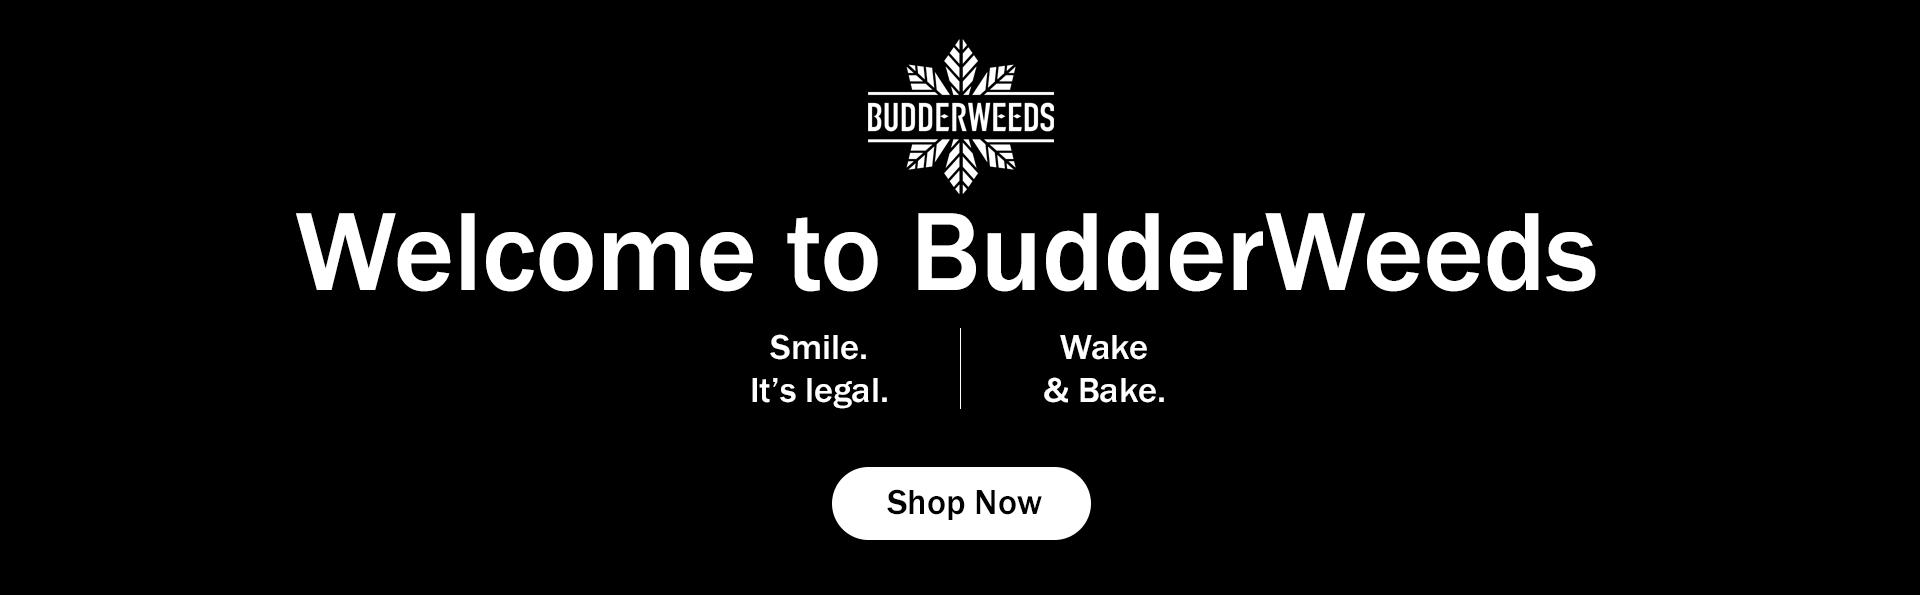 BudderWeeds - Home Slider 01